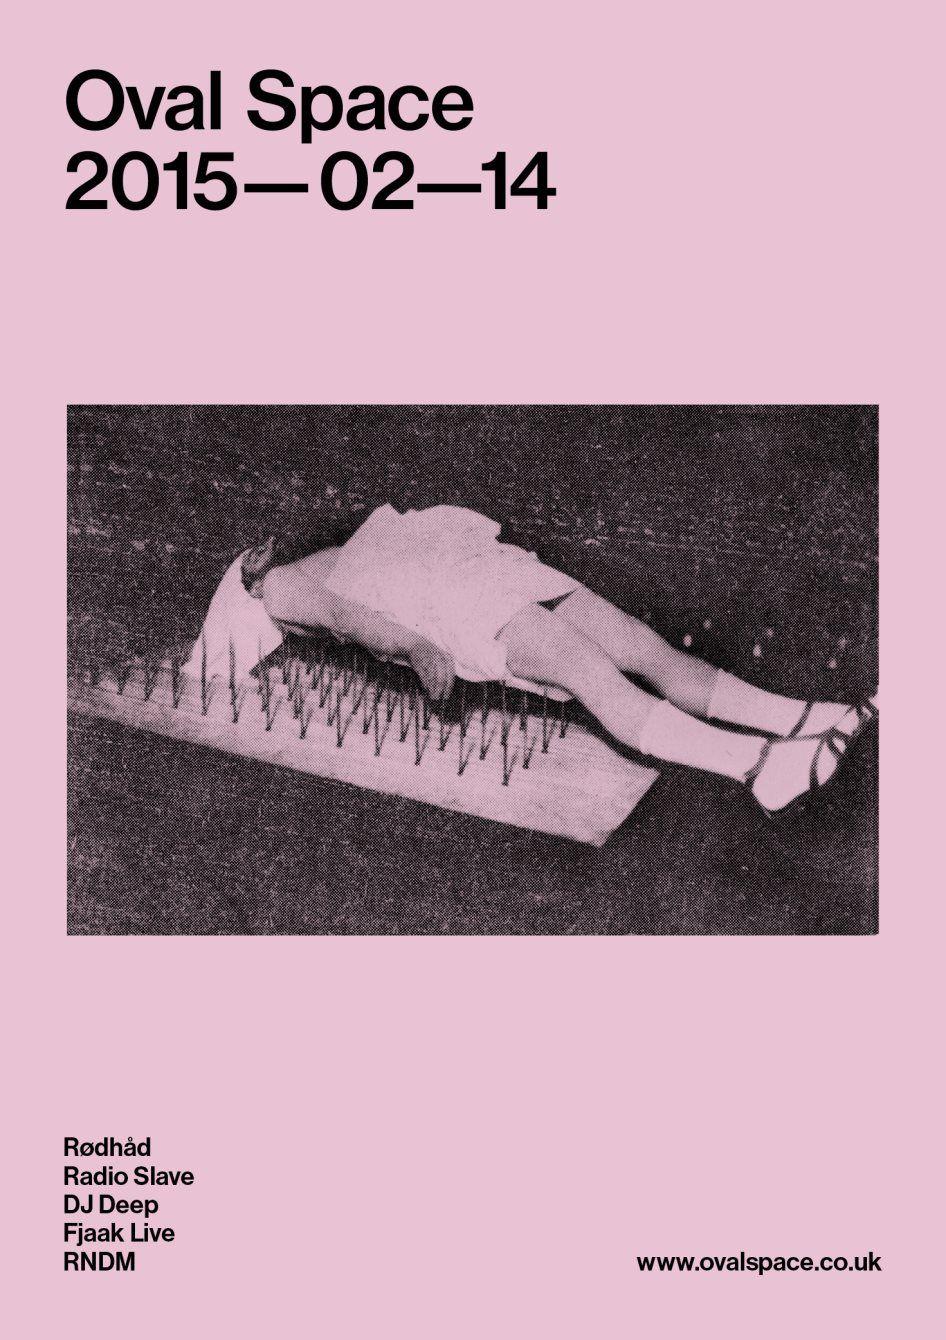 RA: Oval Space Music presents Rødhåd, Radio Slave, DJ Deep, Fjaak Live, Rndm at Oval Space, London (2015)